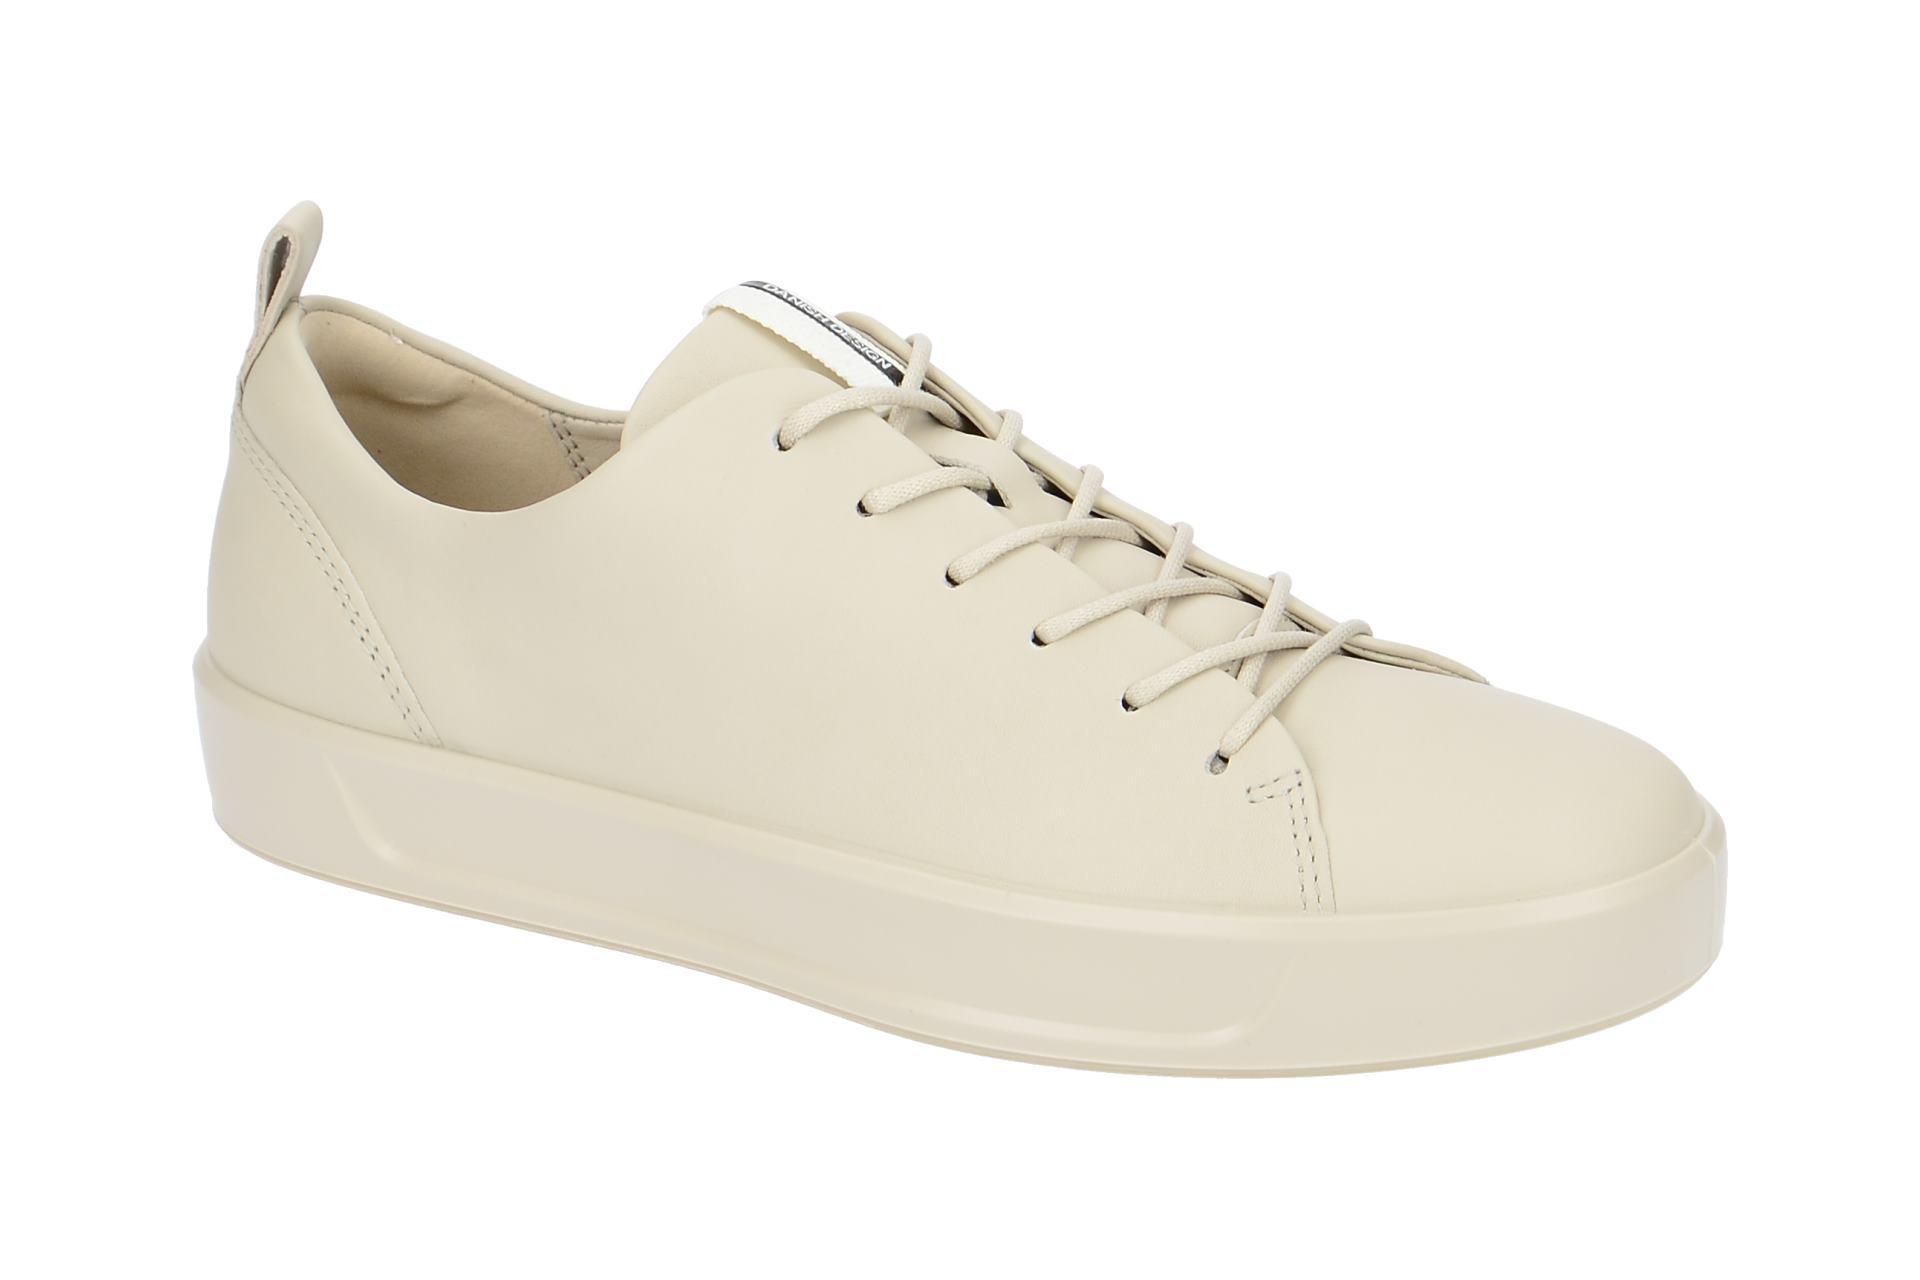 750f2f586b36 Ecco Schuhe SOFT 8 LADIES grau Damenschuhe Halbschuhe 44050301163 ...